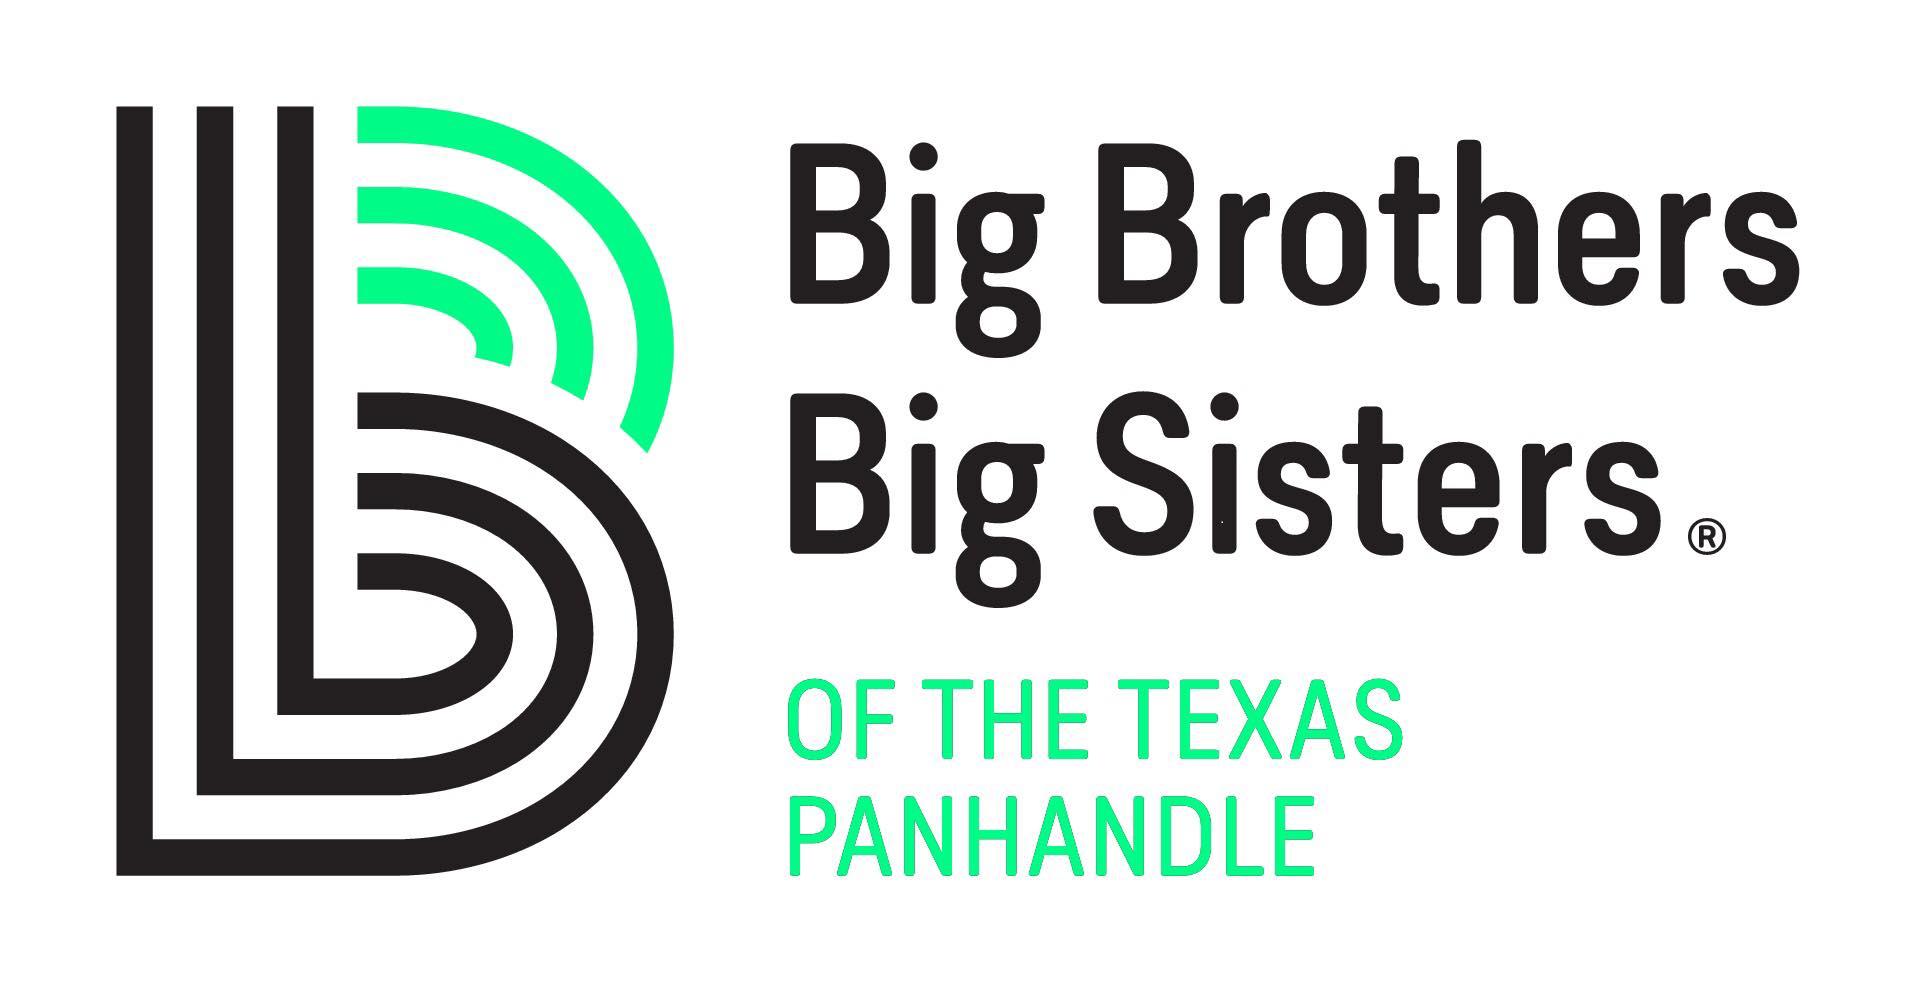 BIG BROTHERS BIG SISTERS NEW LOGO_1559071626319.jpg.jpg